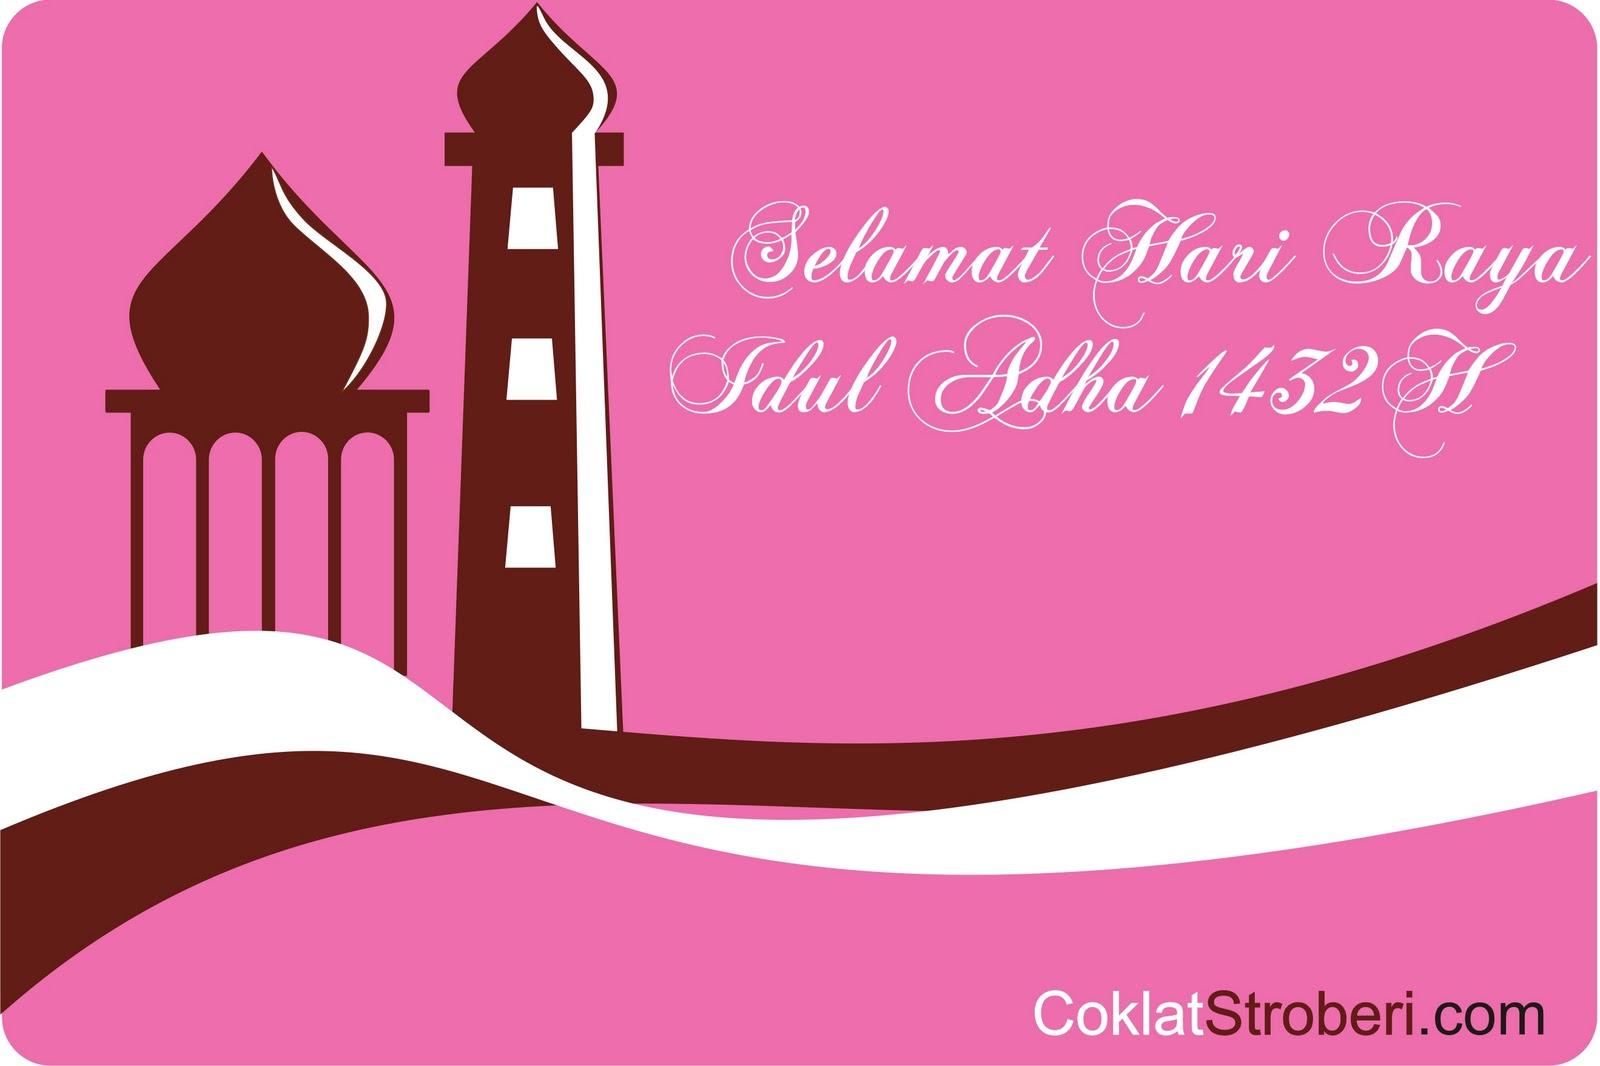 Puisi Selamat Hari Raya Idul Adha 1434 H 2013 | Loe To Ye